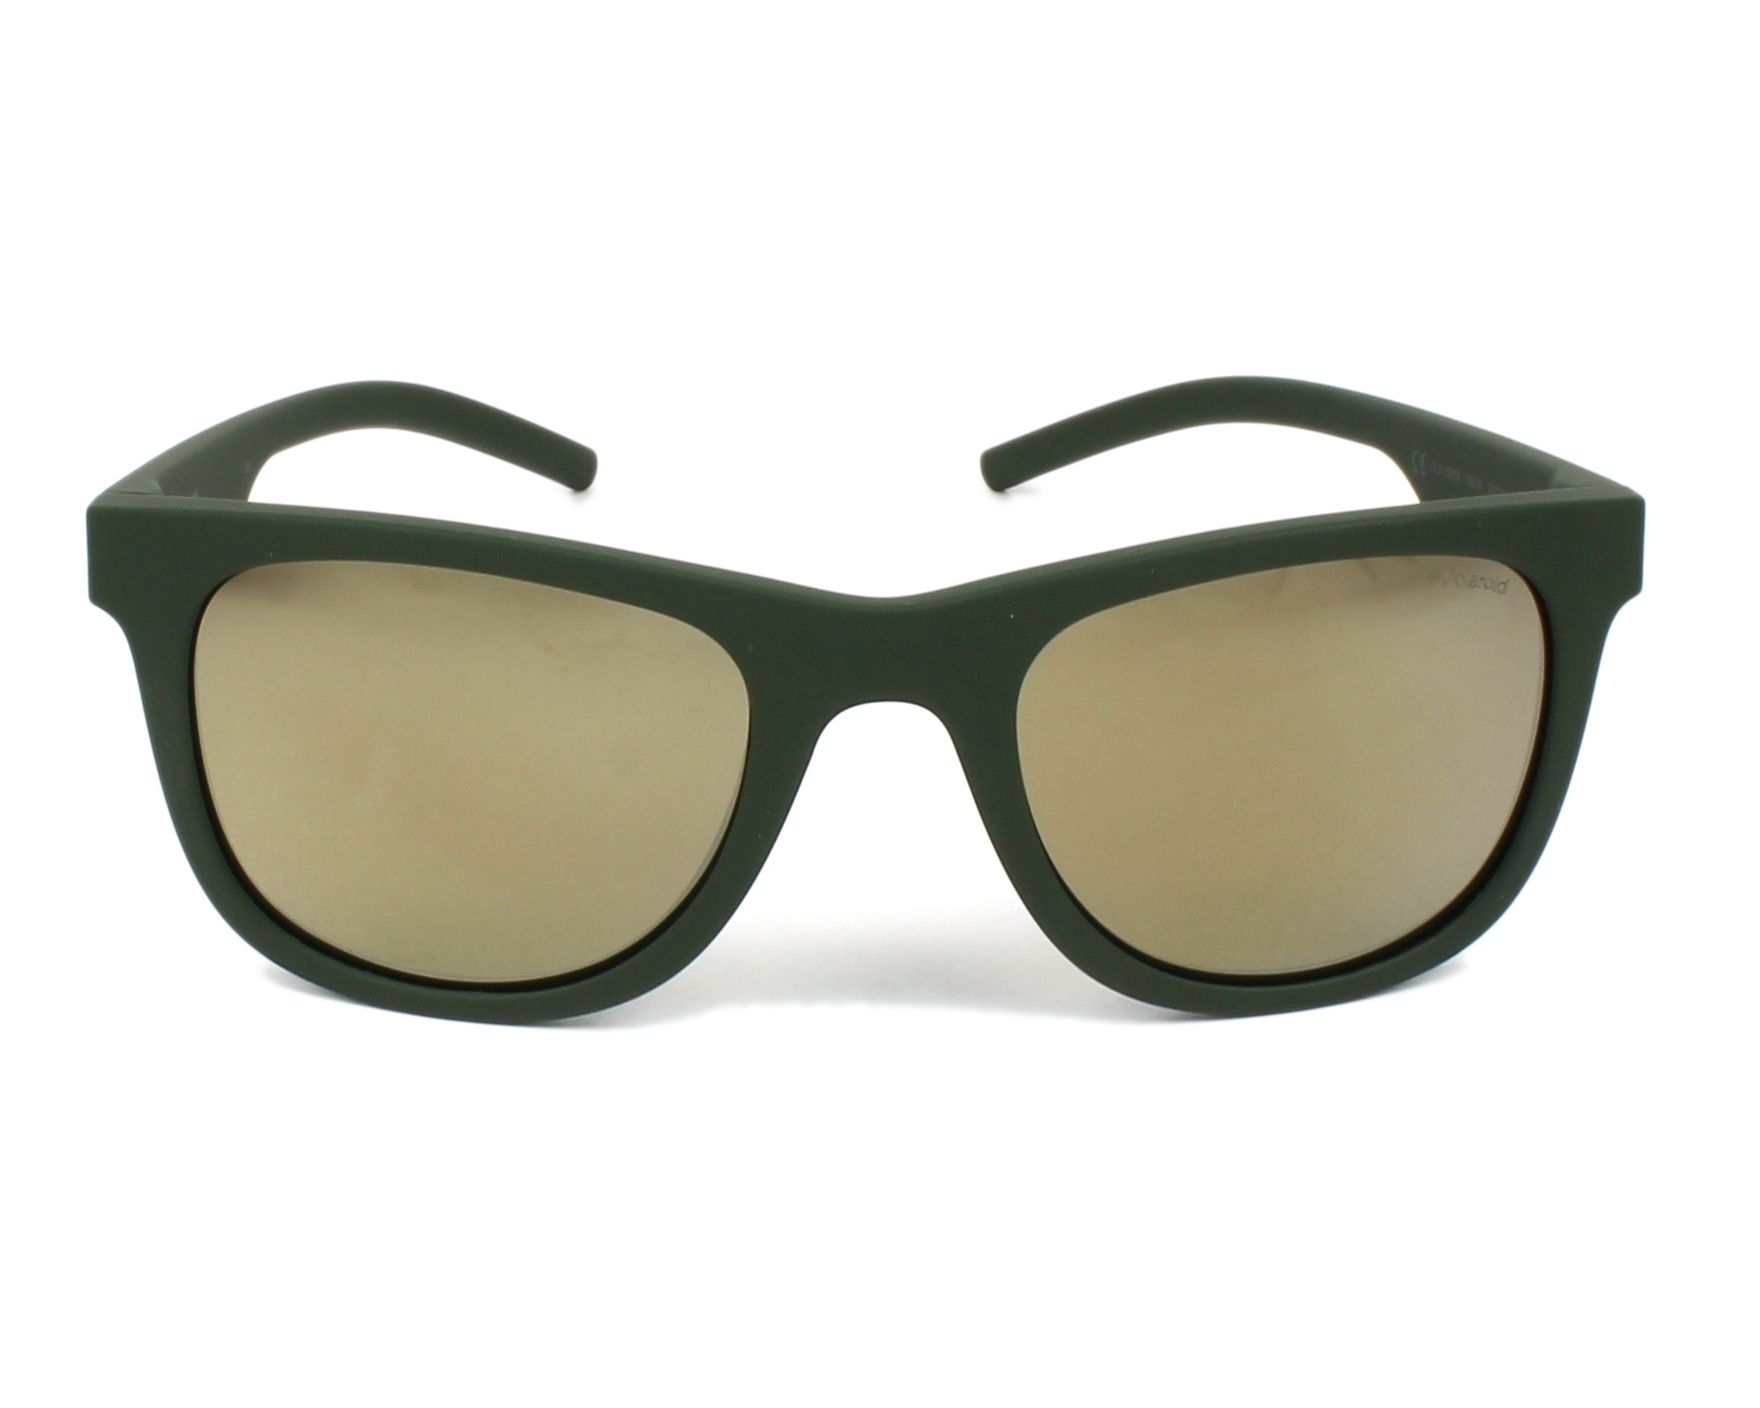 7a6de52f7b0 thumbnail Sunglasses Polaroid PLD-7020-S 1ED LM - Green front view